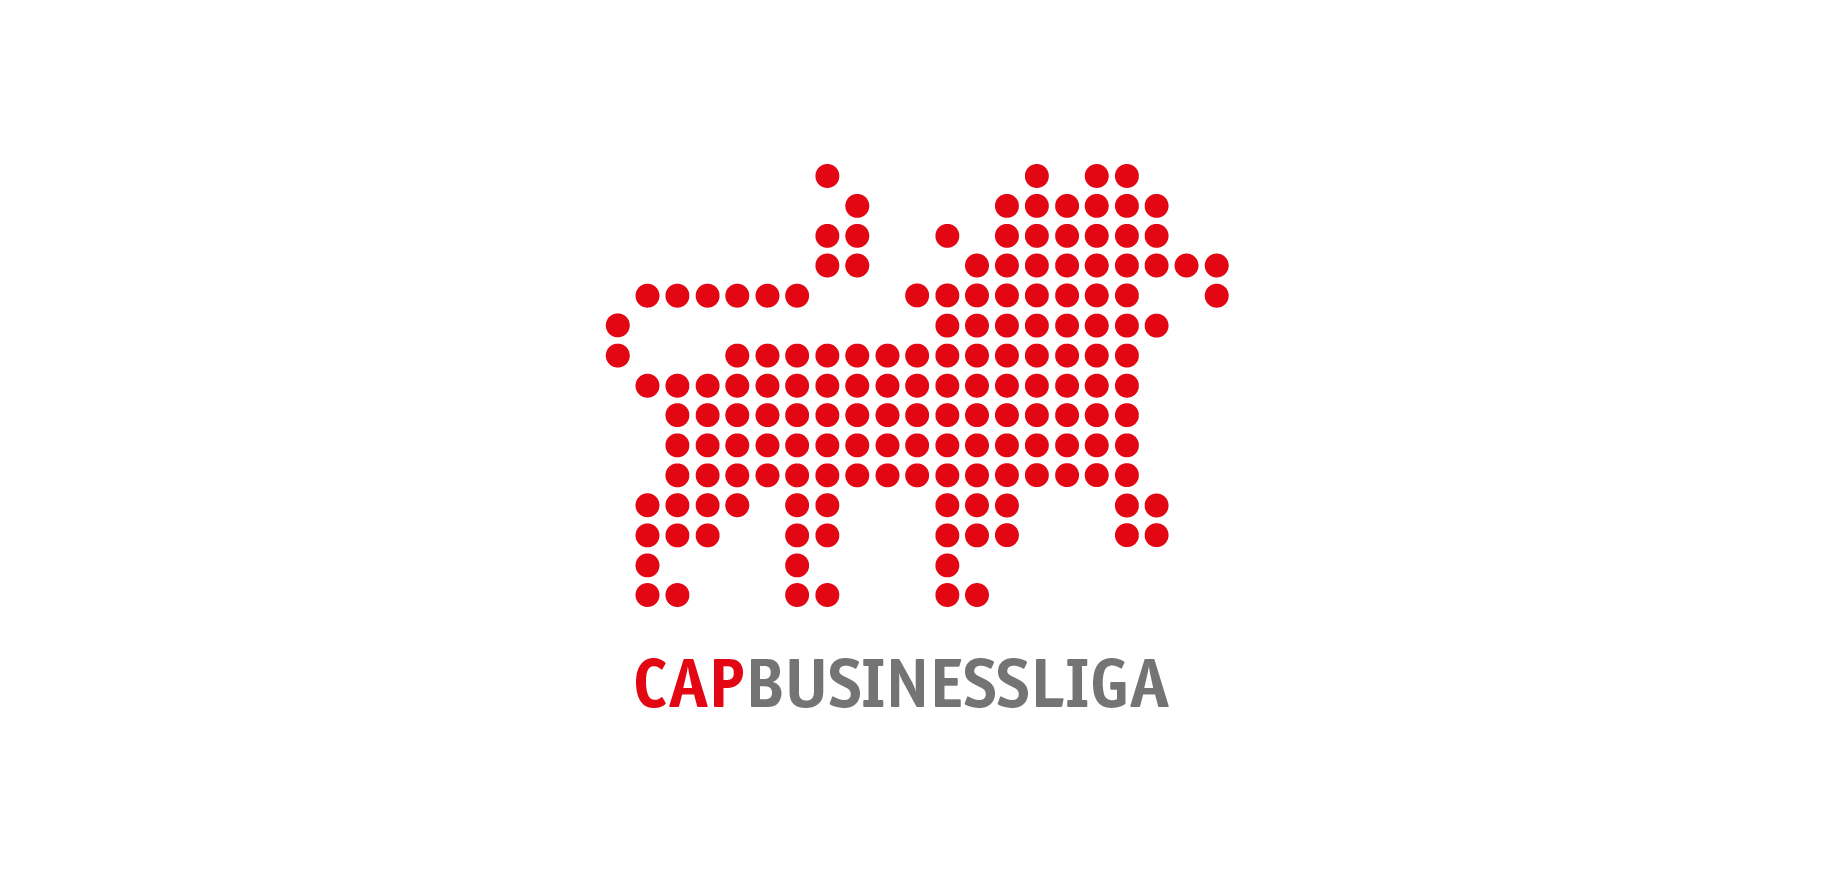 Businessliga